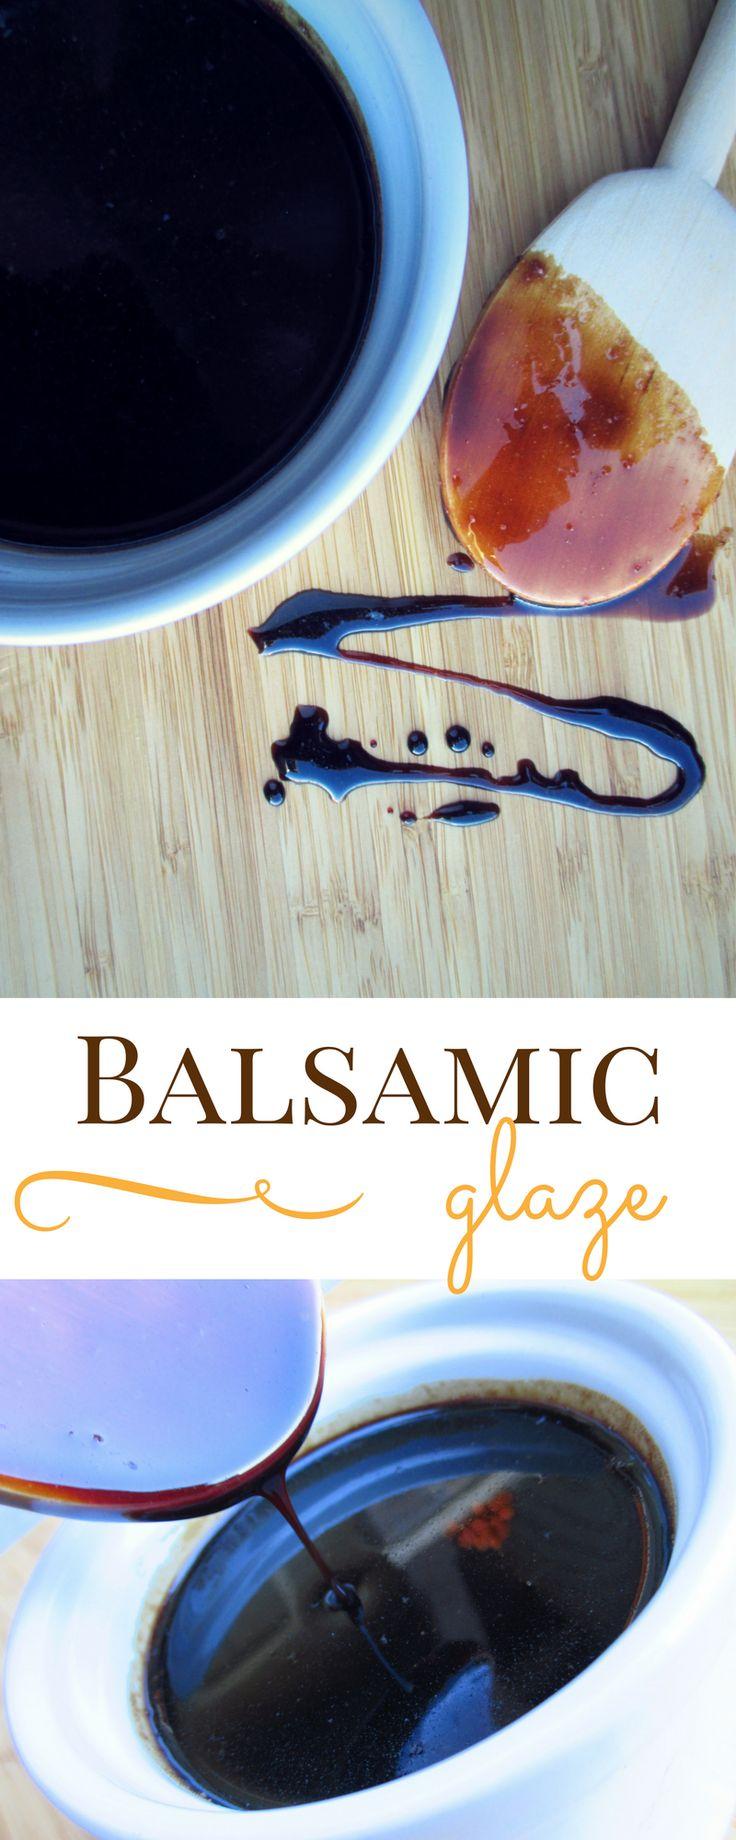 How to Make Balsamic Glaze http://hearthookhome.com/how-to-make-balsamic-glaze/?utm_campaign=coschedule&utm_source=pinterest&utm_medium=Ashlea%20K%20-%20Heart%2C%20Hook%2C%20Home&utm_content=How%20to%20Make%20Balsamic%20Glaze